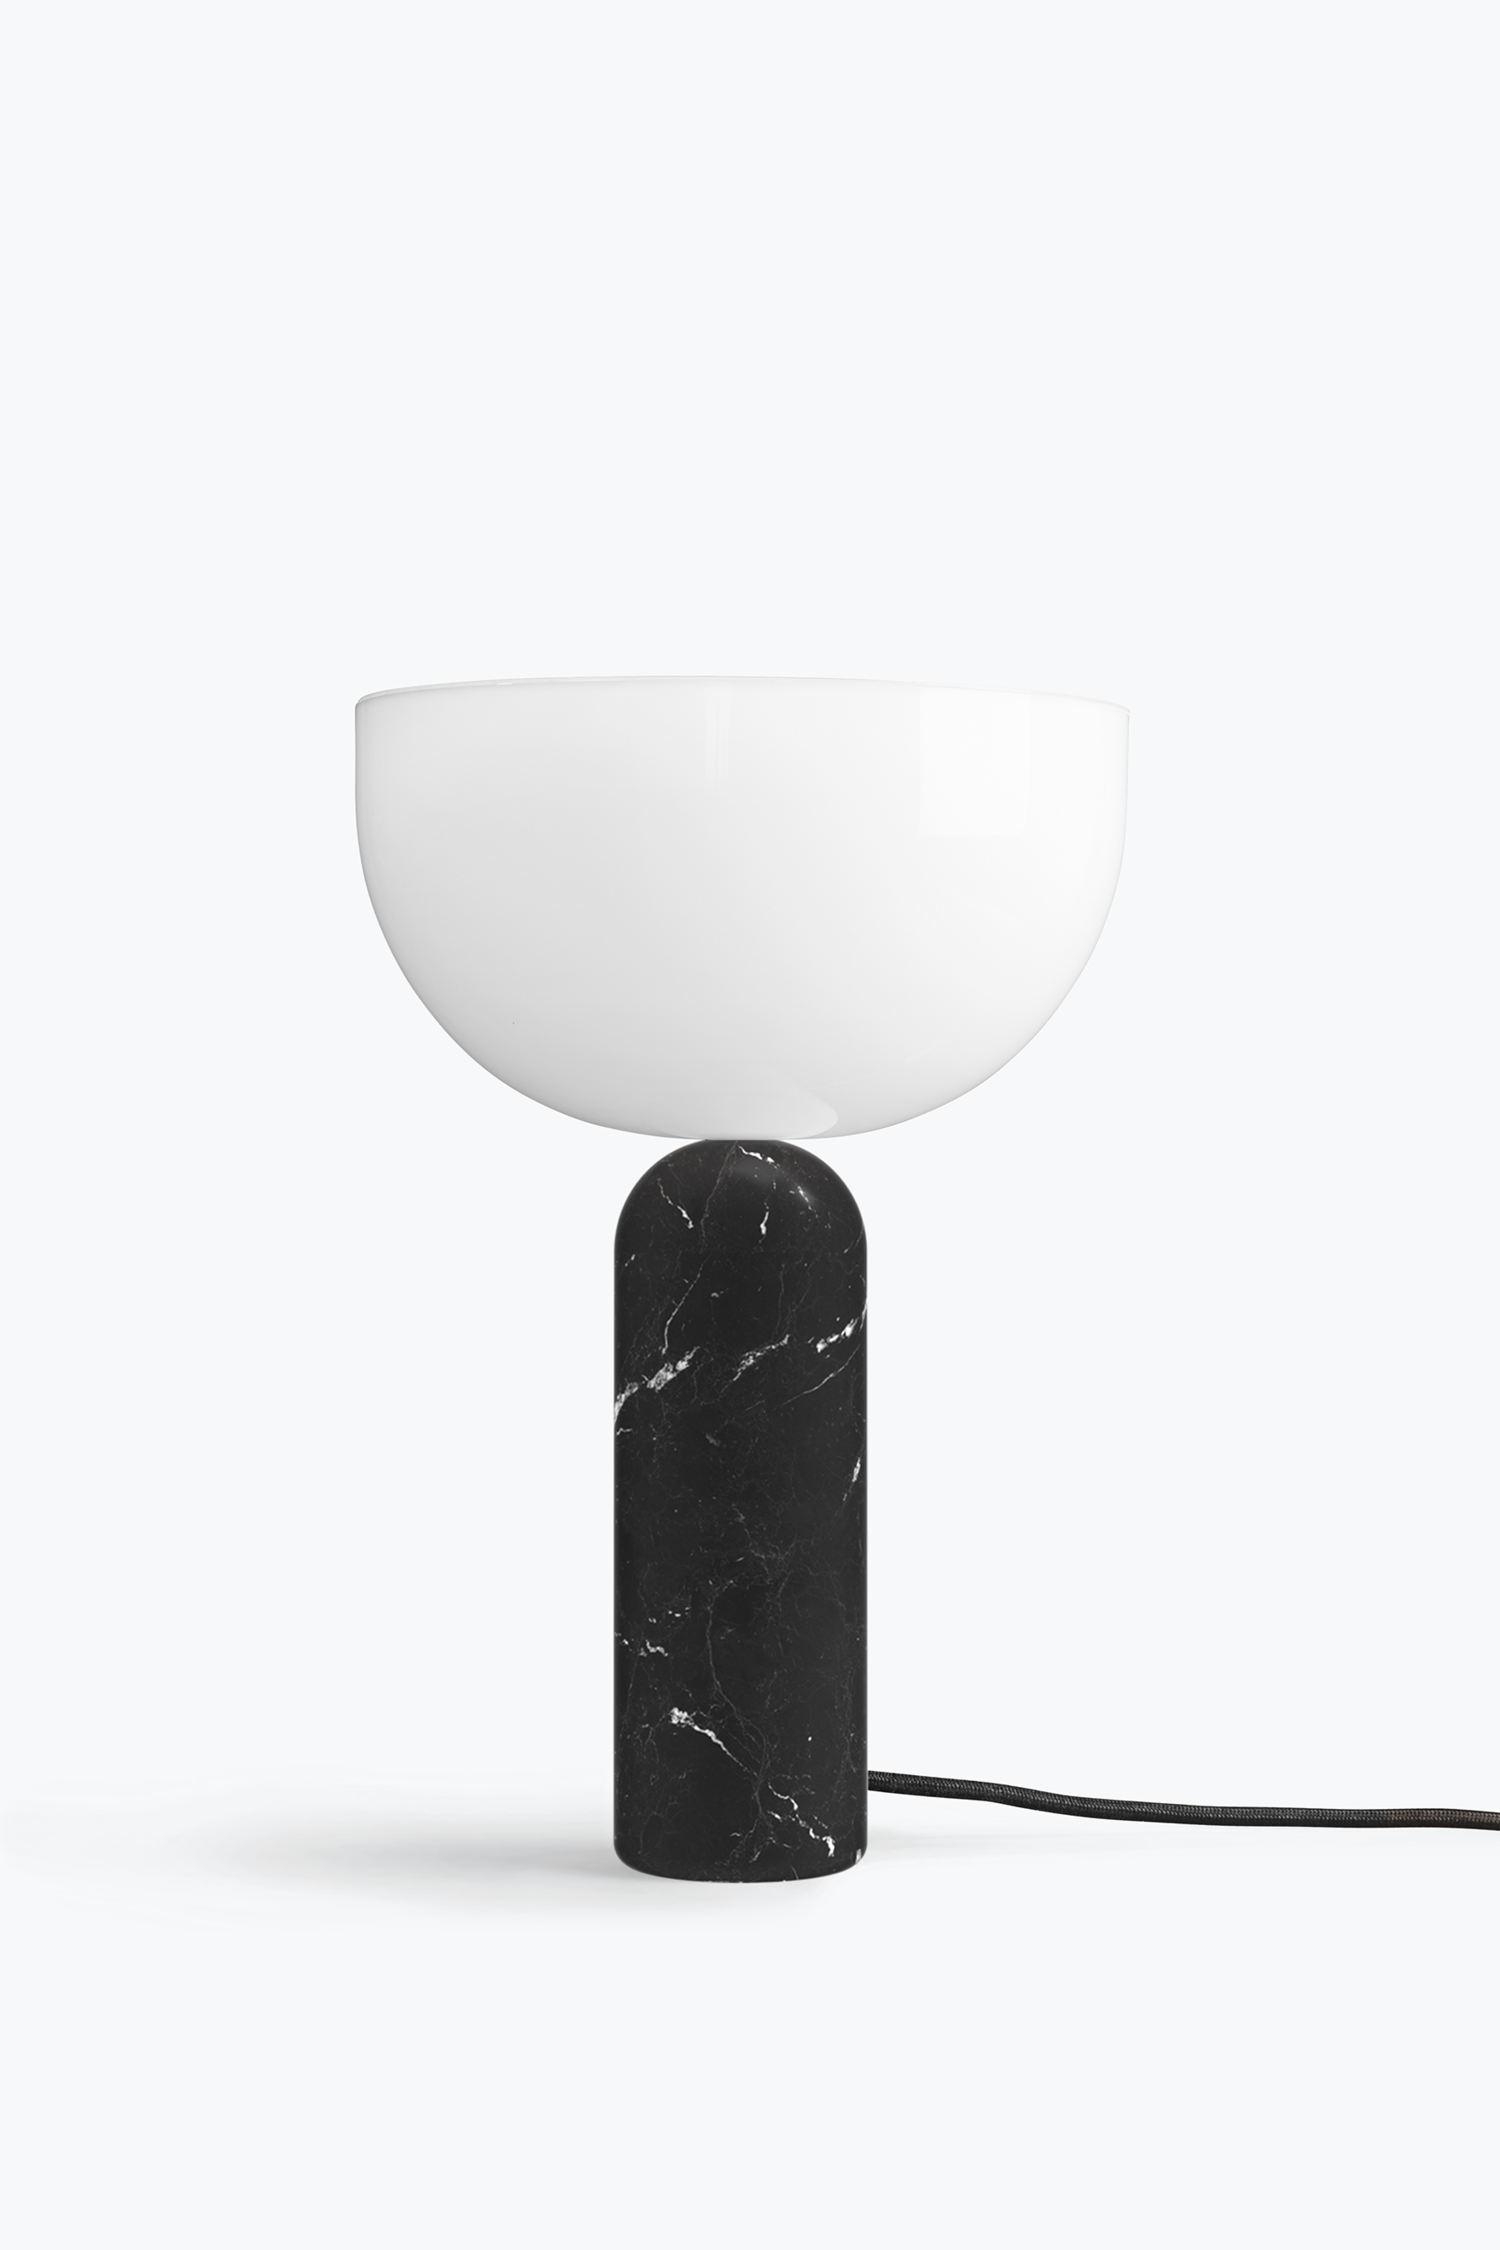 Kizu Table Lamp Black Marble Large New Works Black Table Lamps Table Lamp Wood Table Lamp